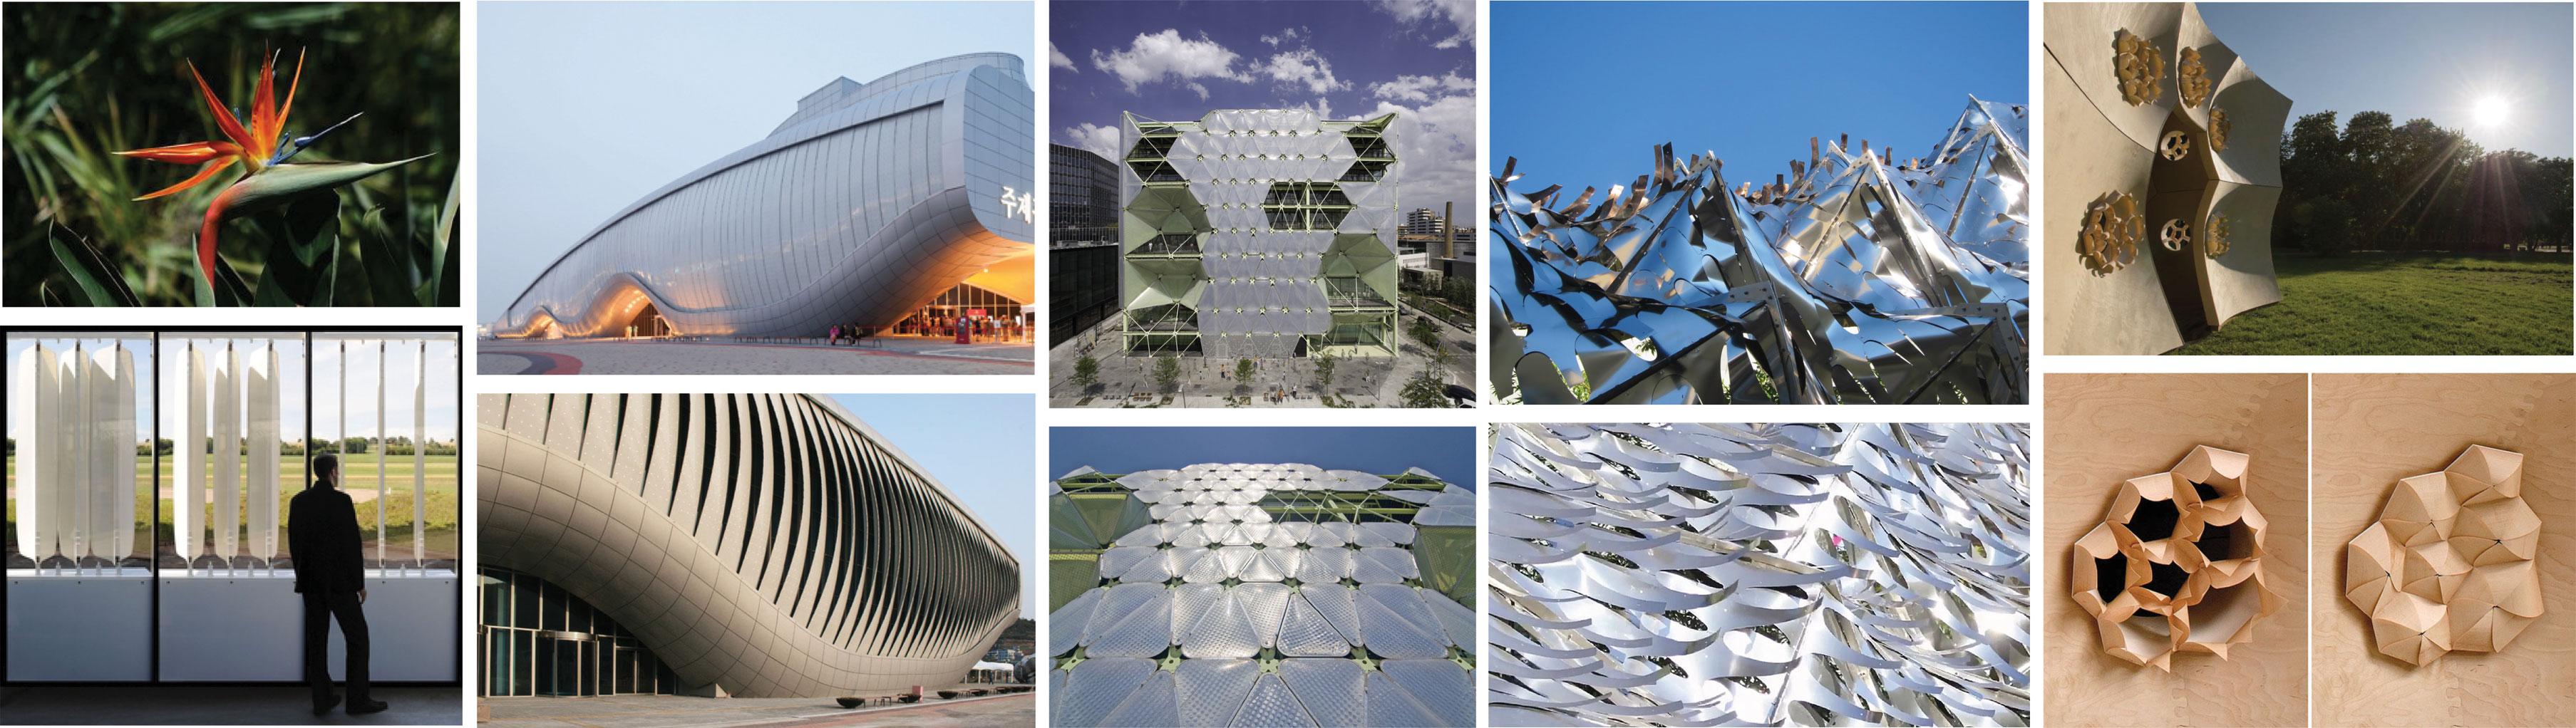 Arquitectura innovasturias el blog del club asturiano for Tesis de arquitectura ejemplos